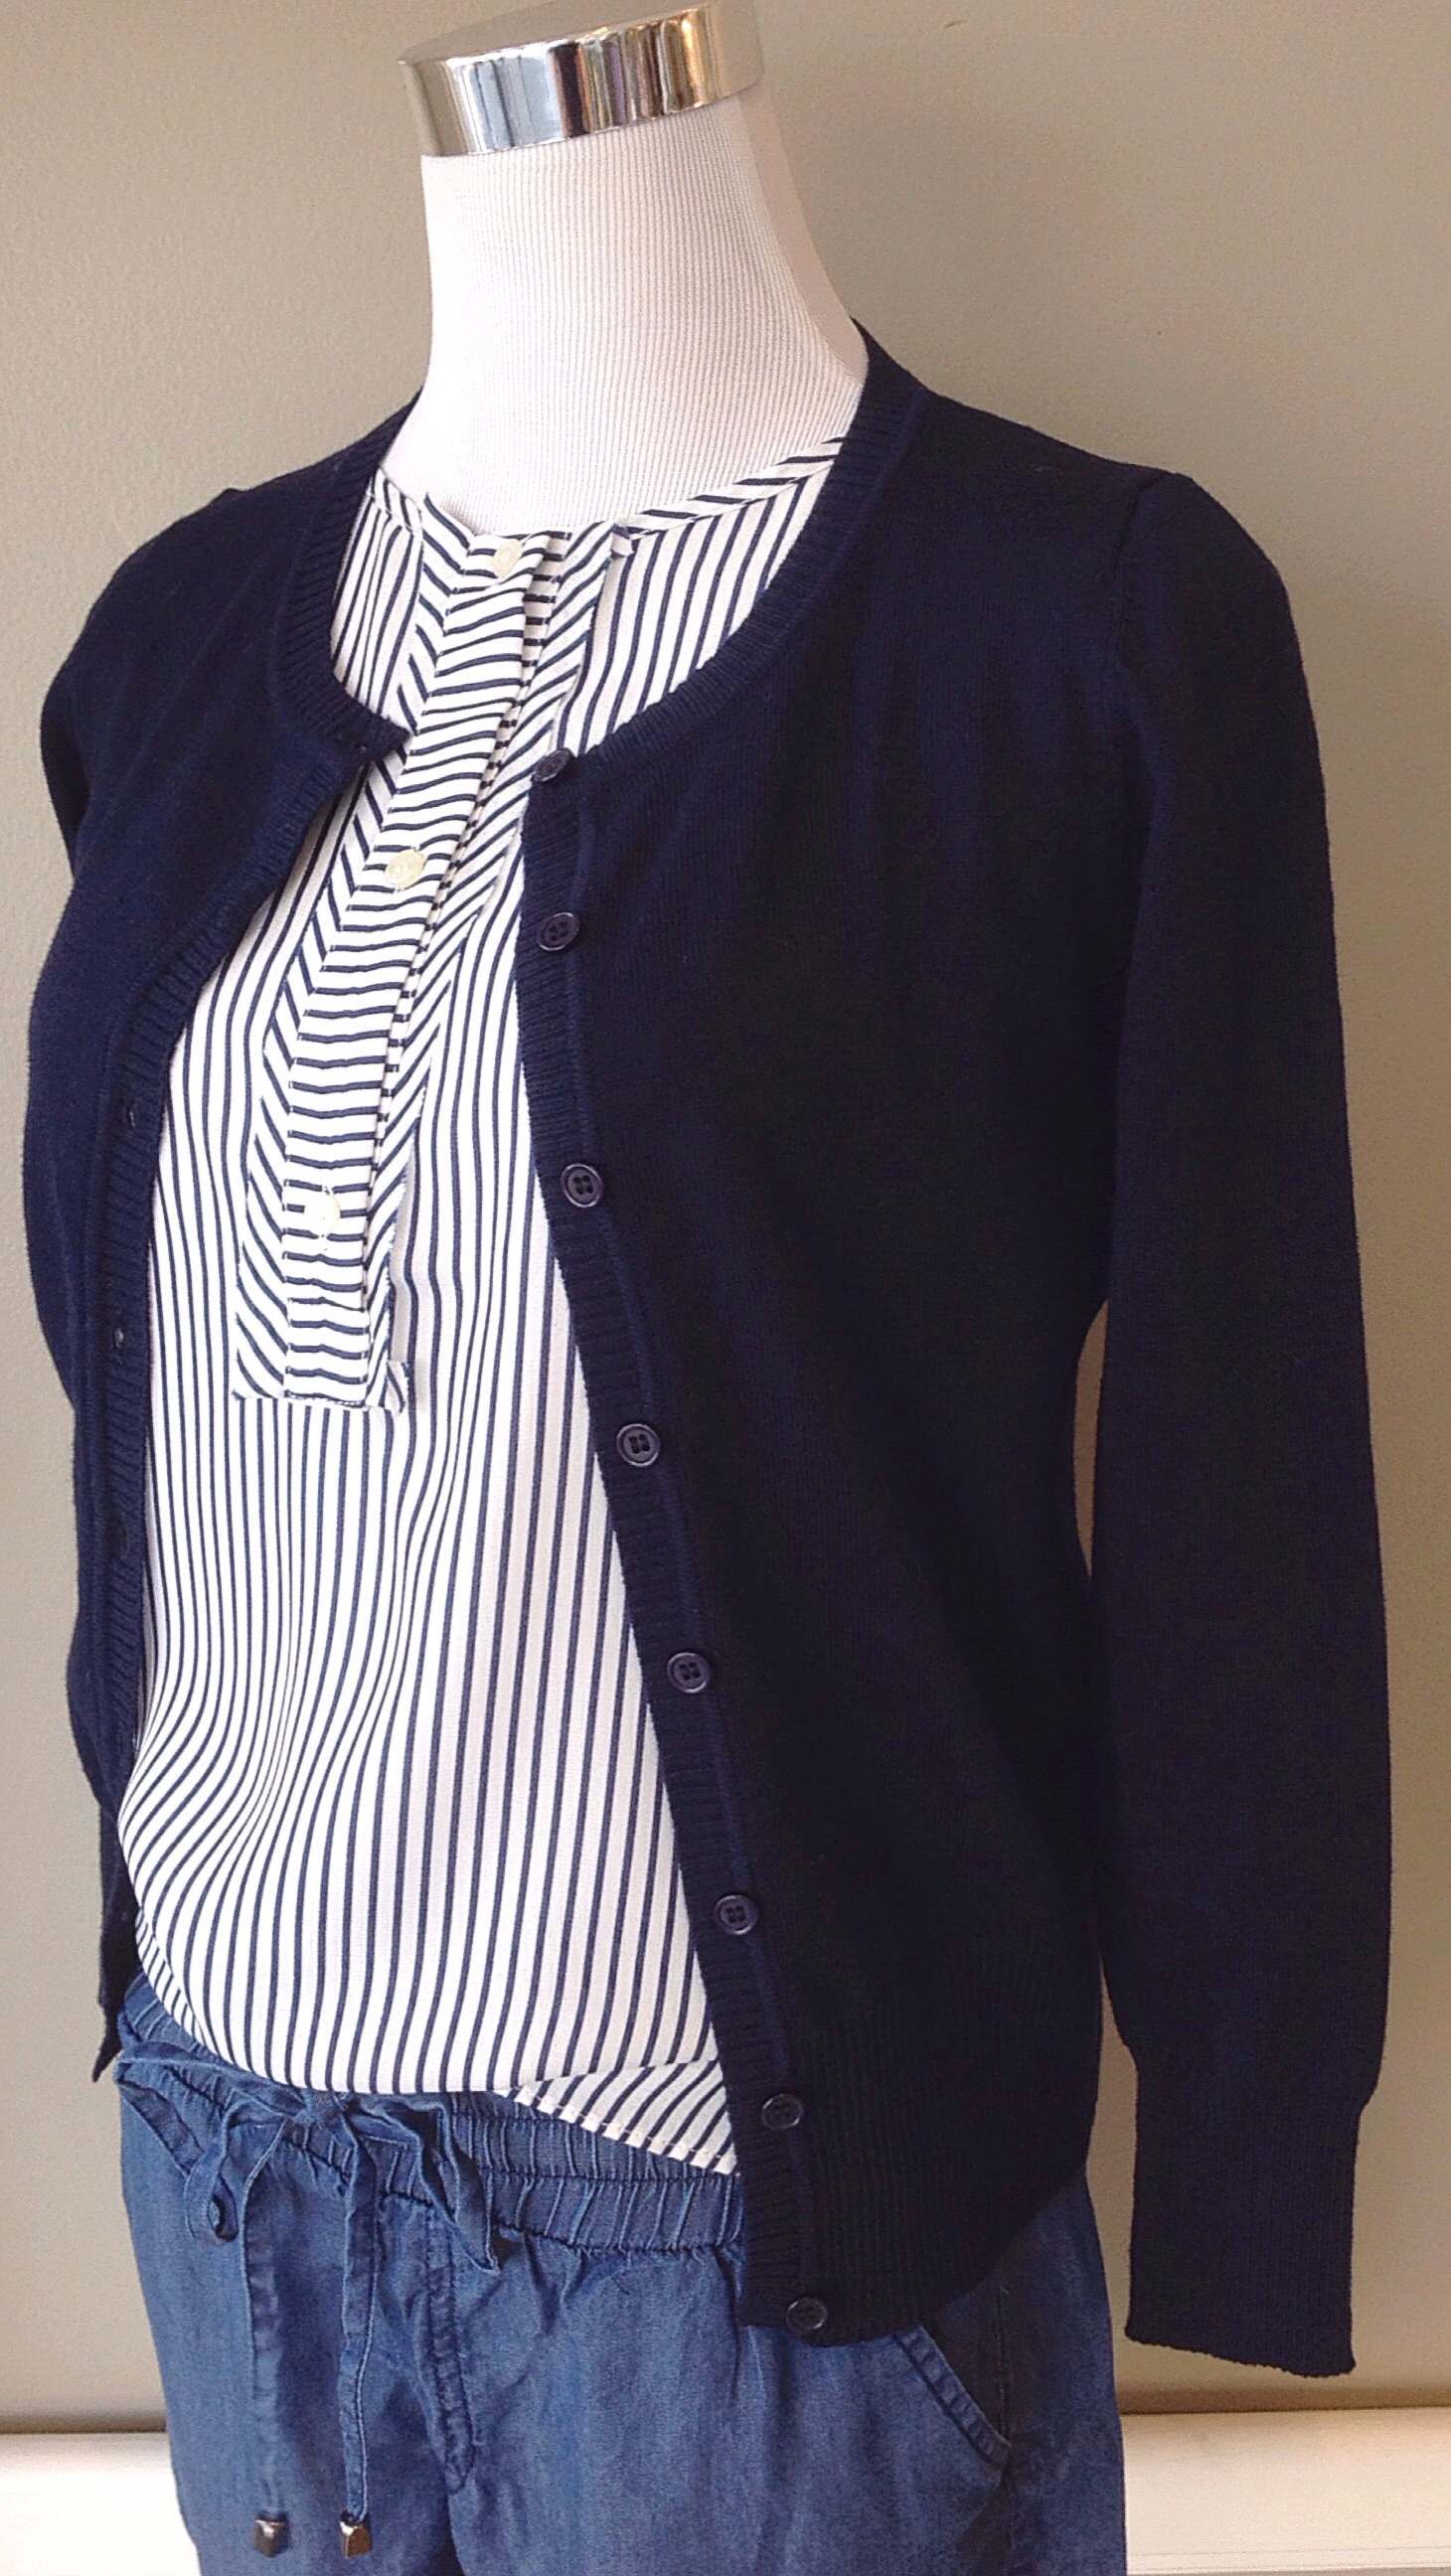 Navy button-down cardigan, $28